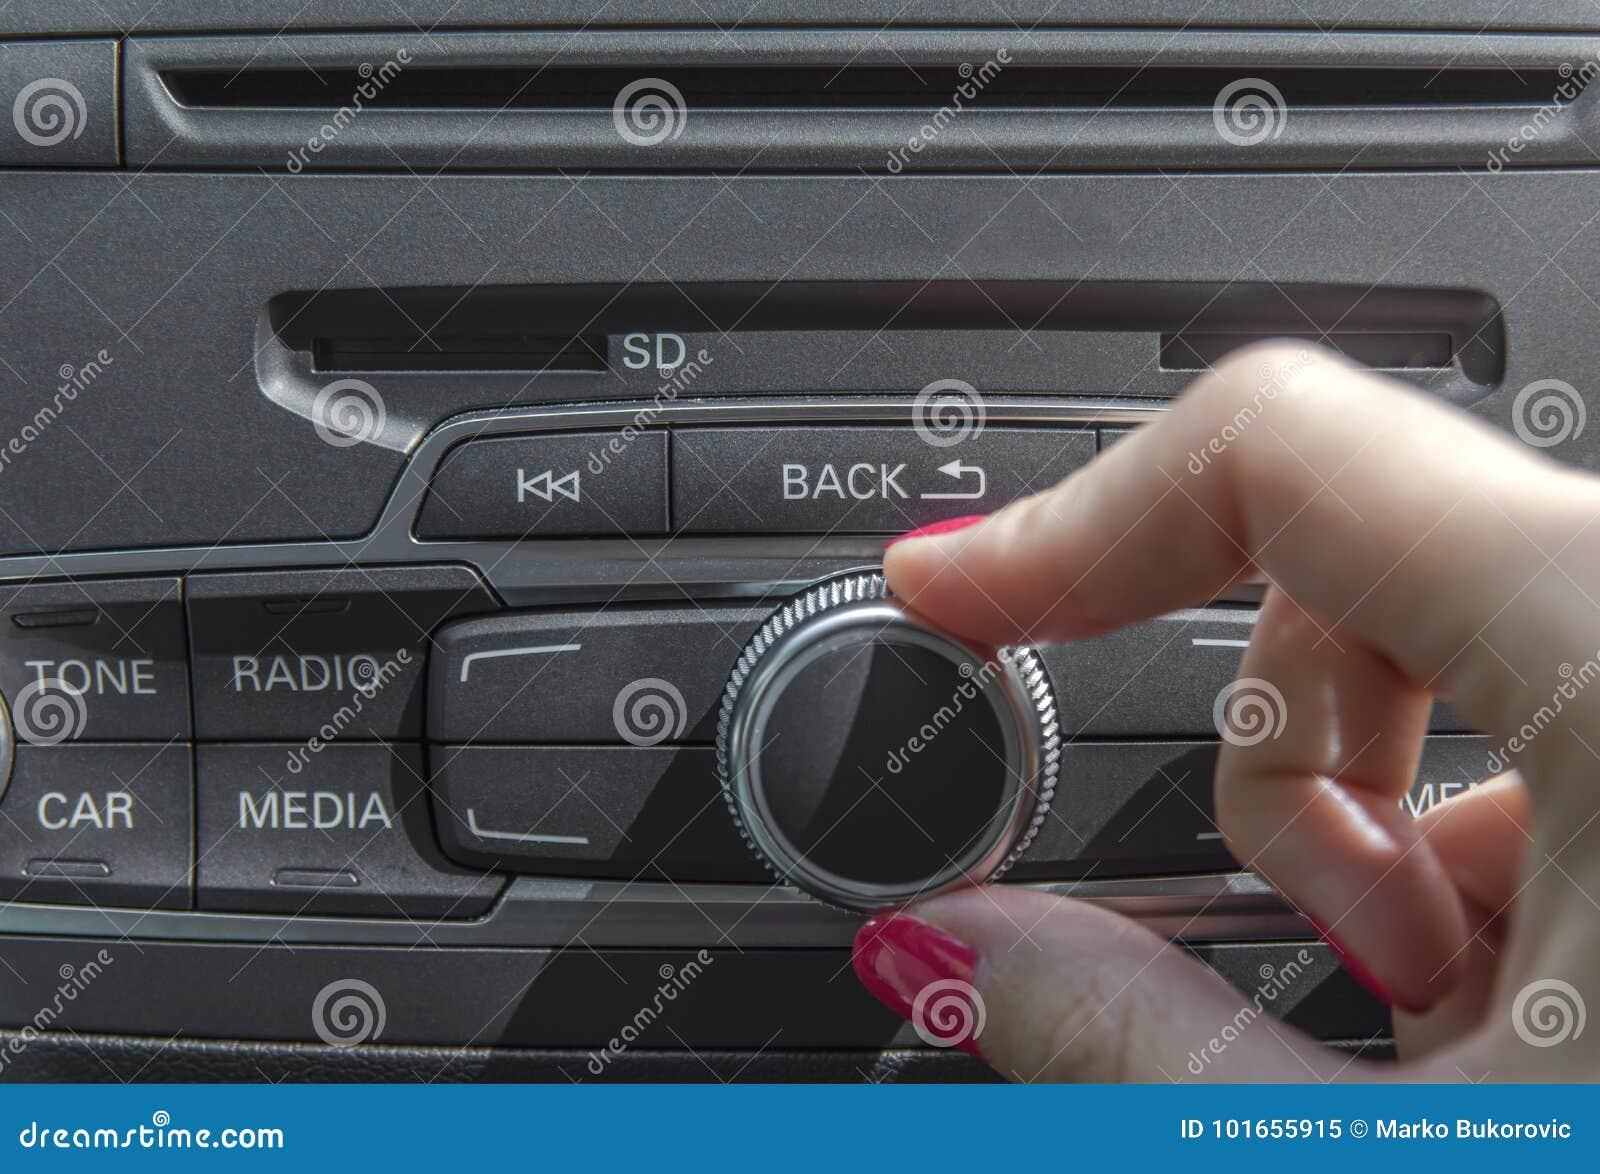 Car radio stereo panel and modern dashboard electric equipment